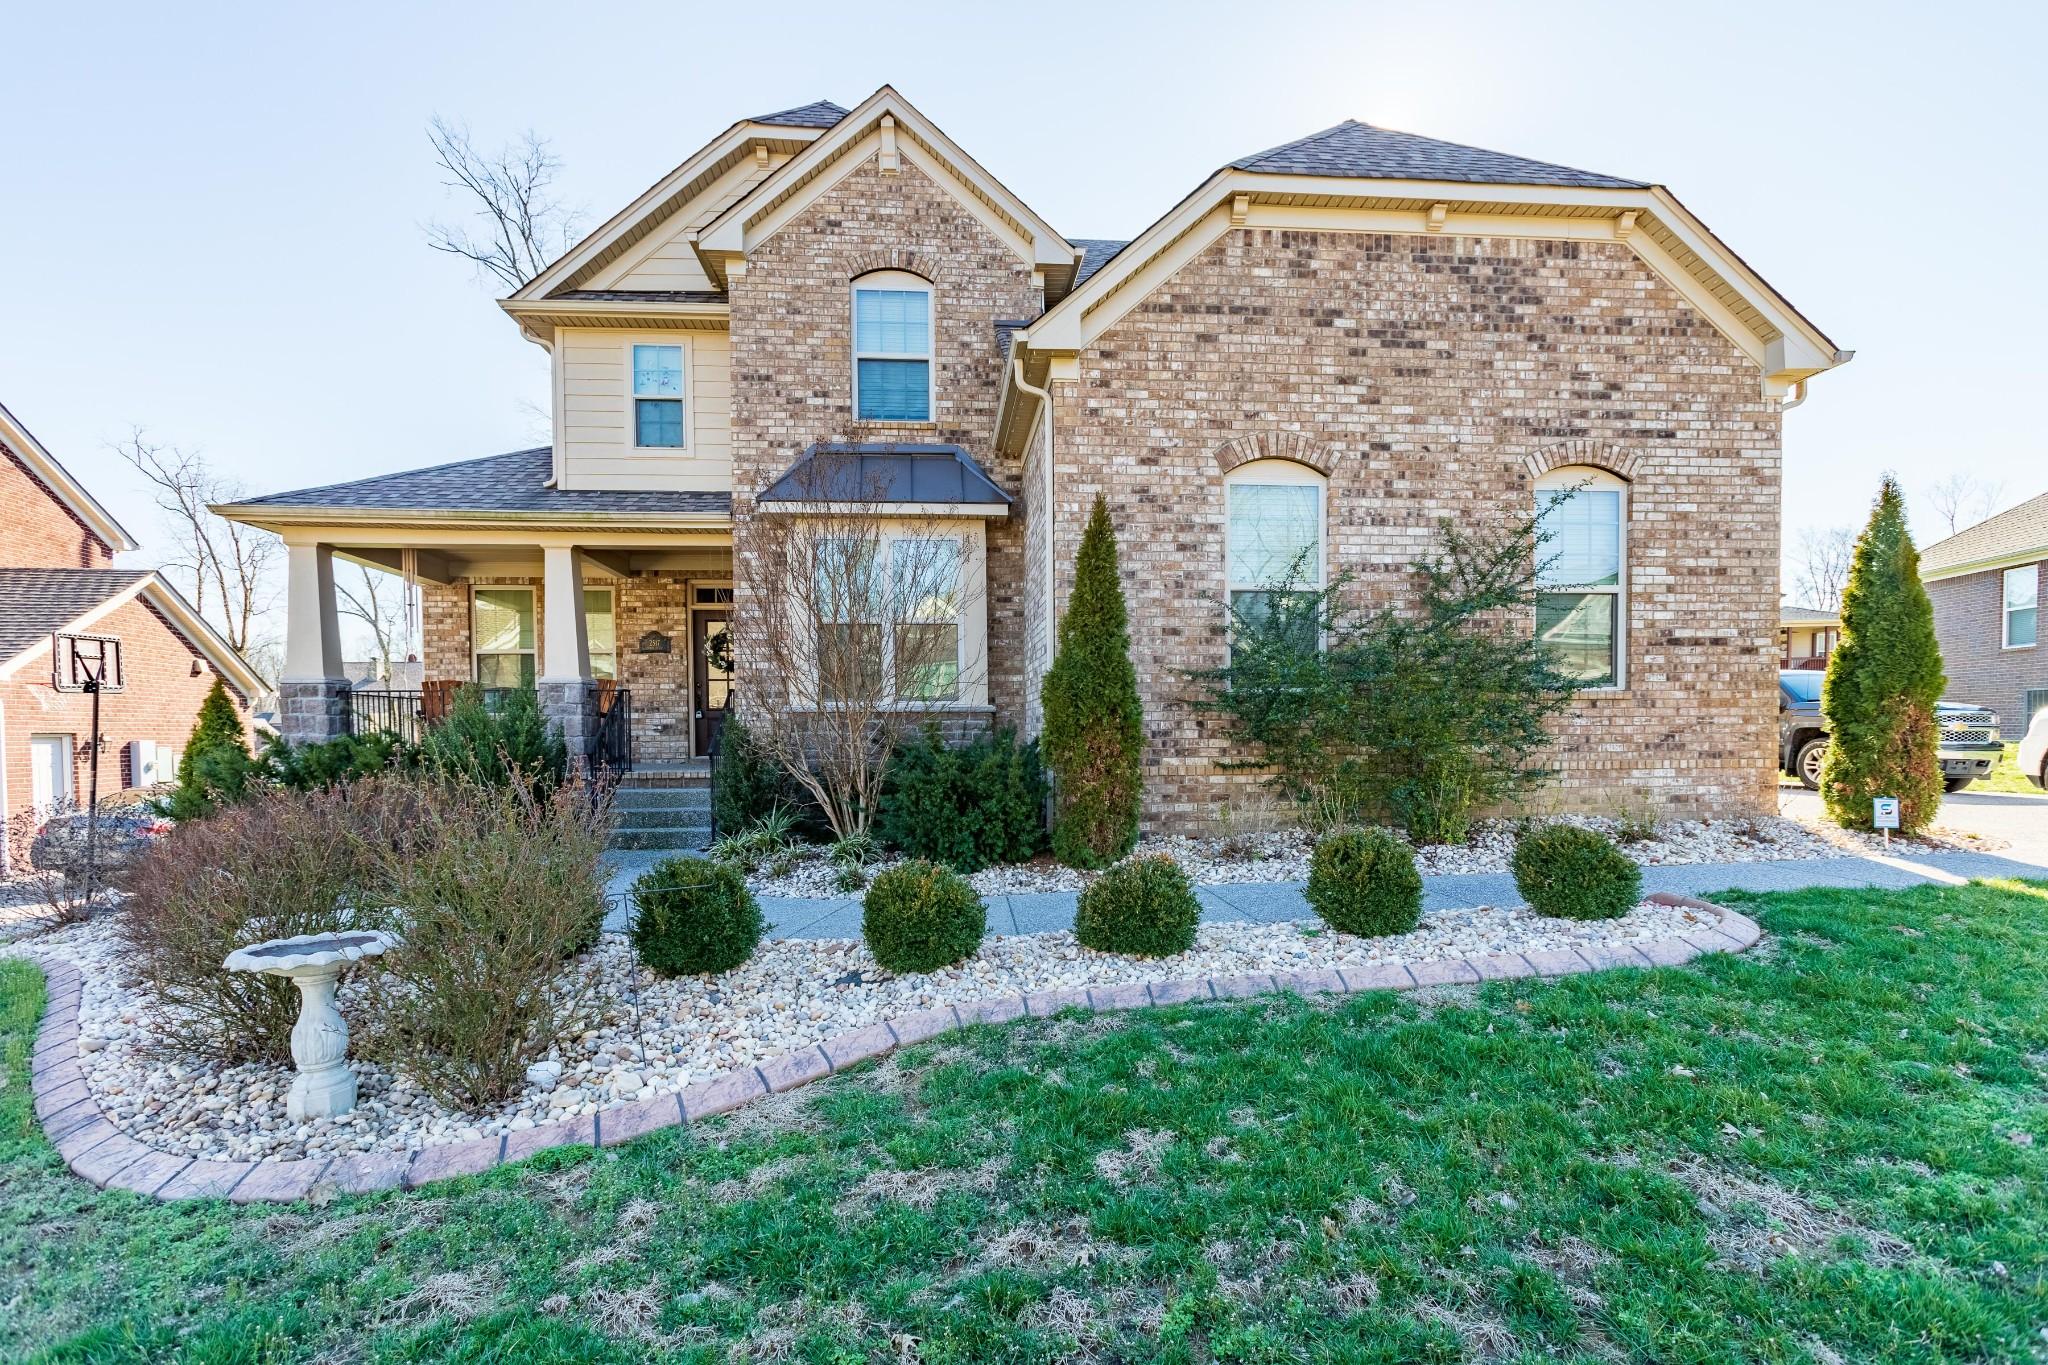 2517 Arbor Pointe Cv, Hermitage, TN 37076 - Hermitage, TN real estate listing